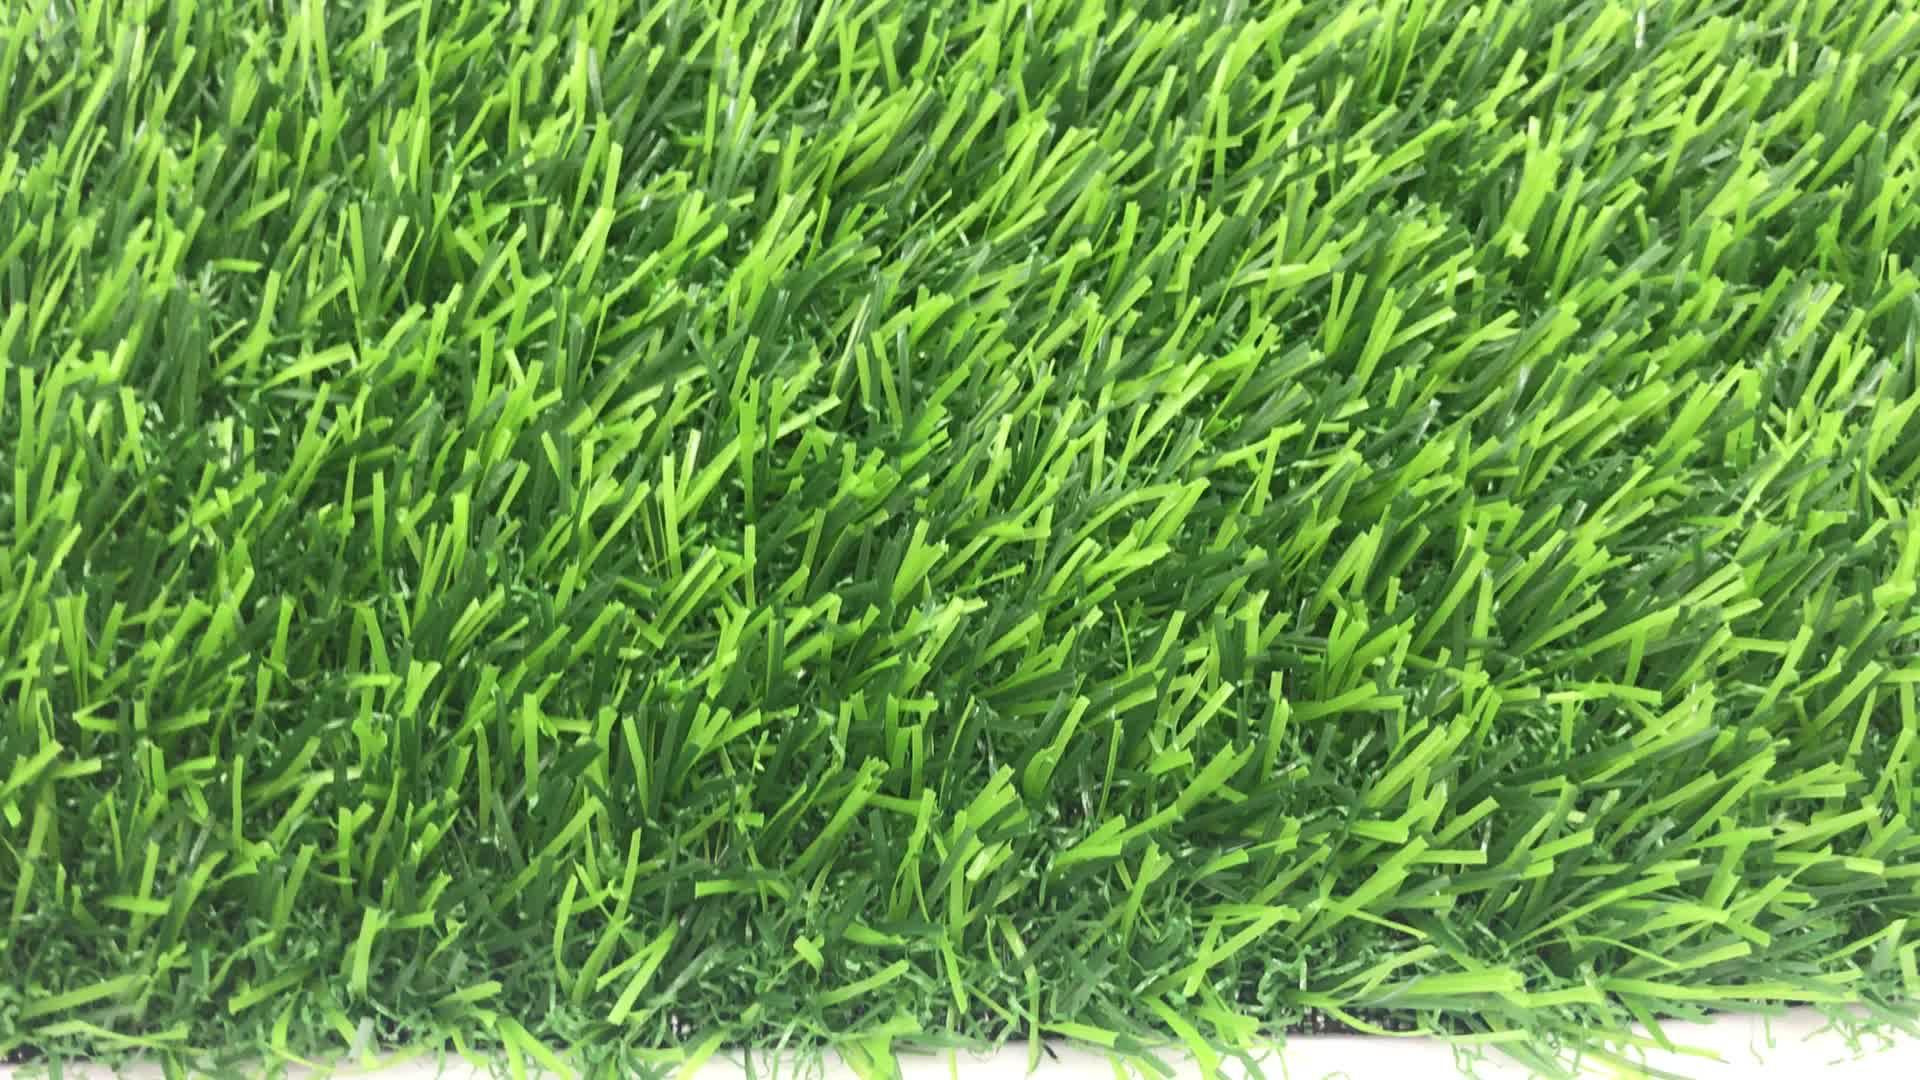 LW03 20 مللي متر ارتفاع الأشعة فوق البنفسجية مقاومة عشب صناعي أخضر للحديقة